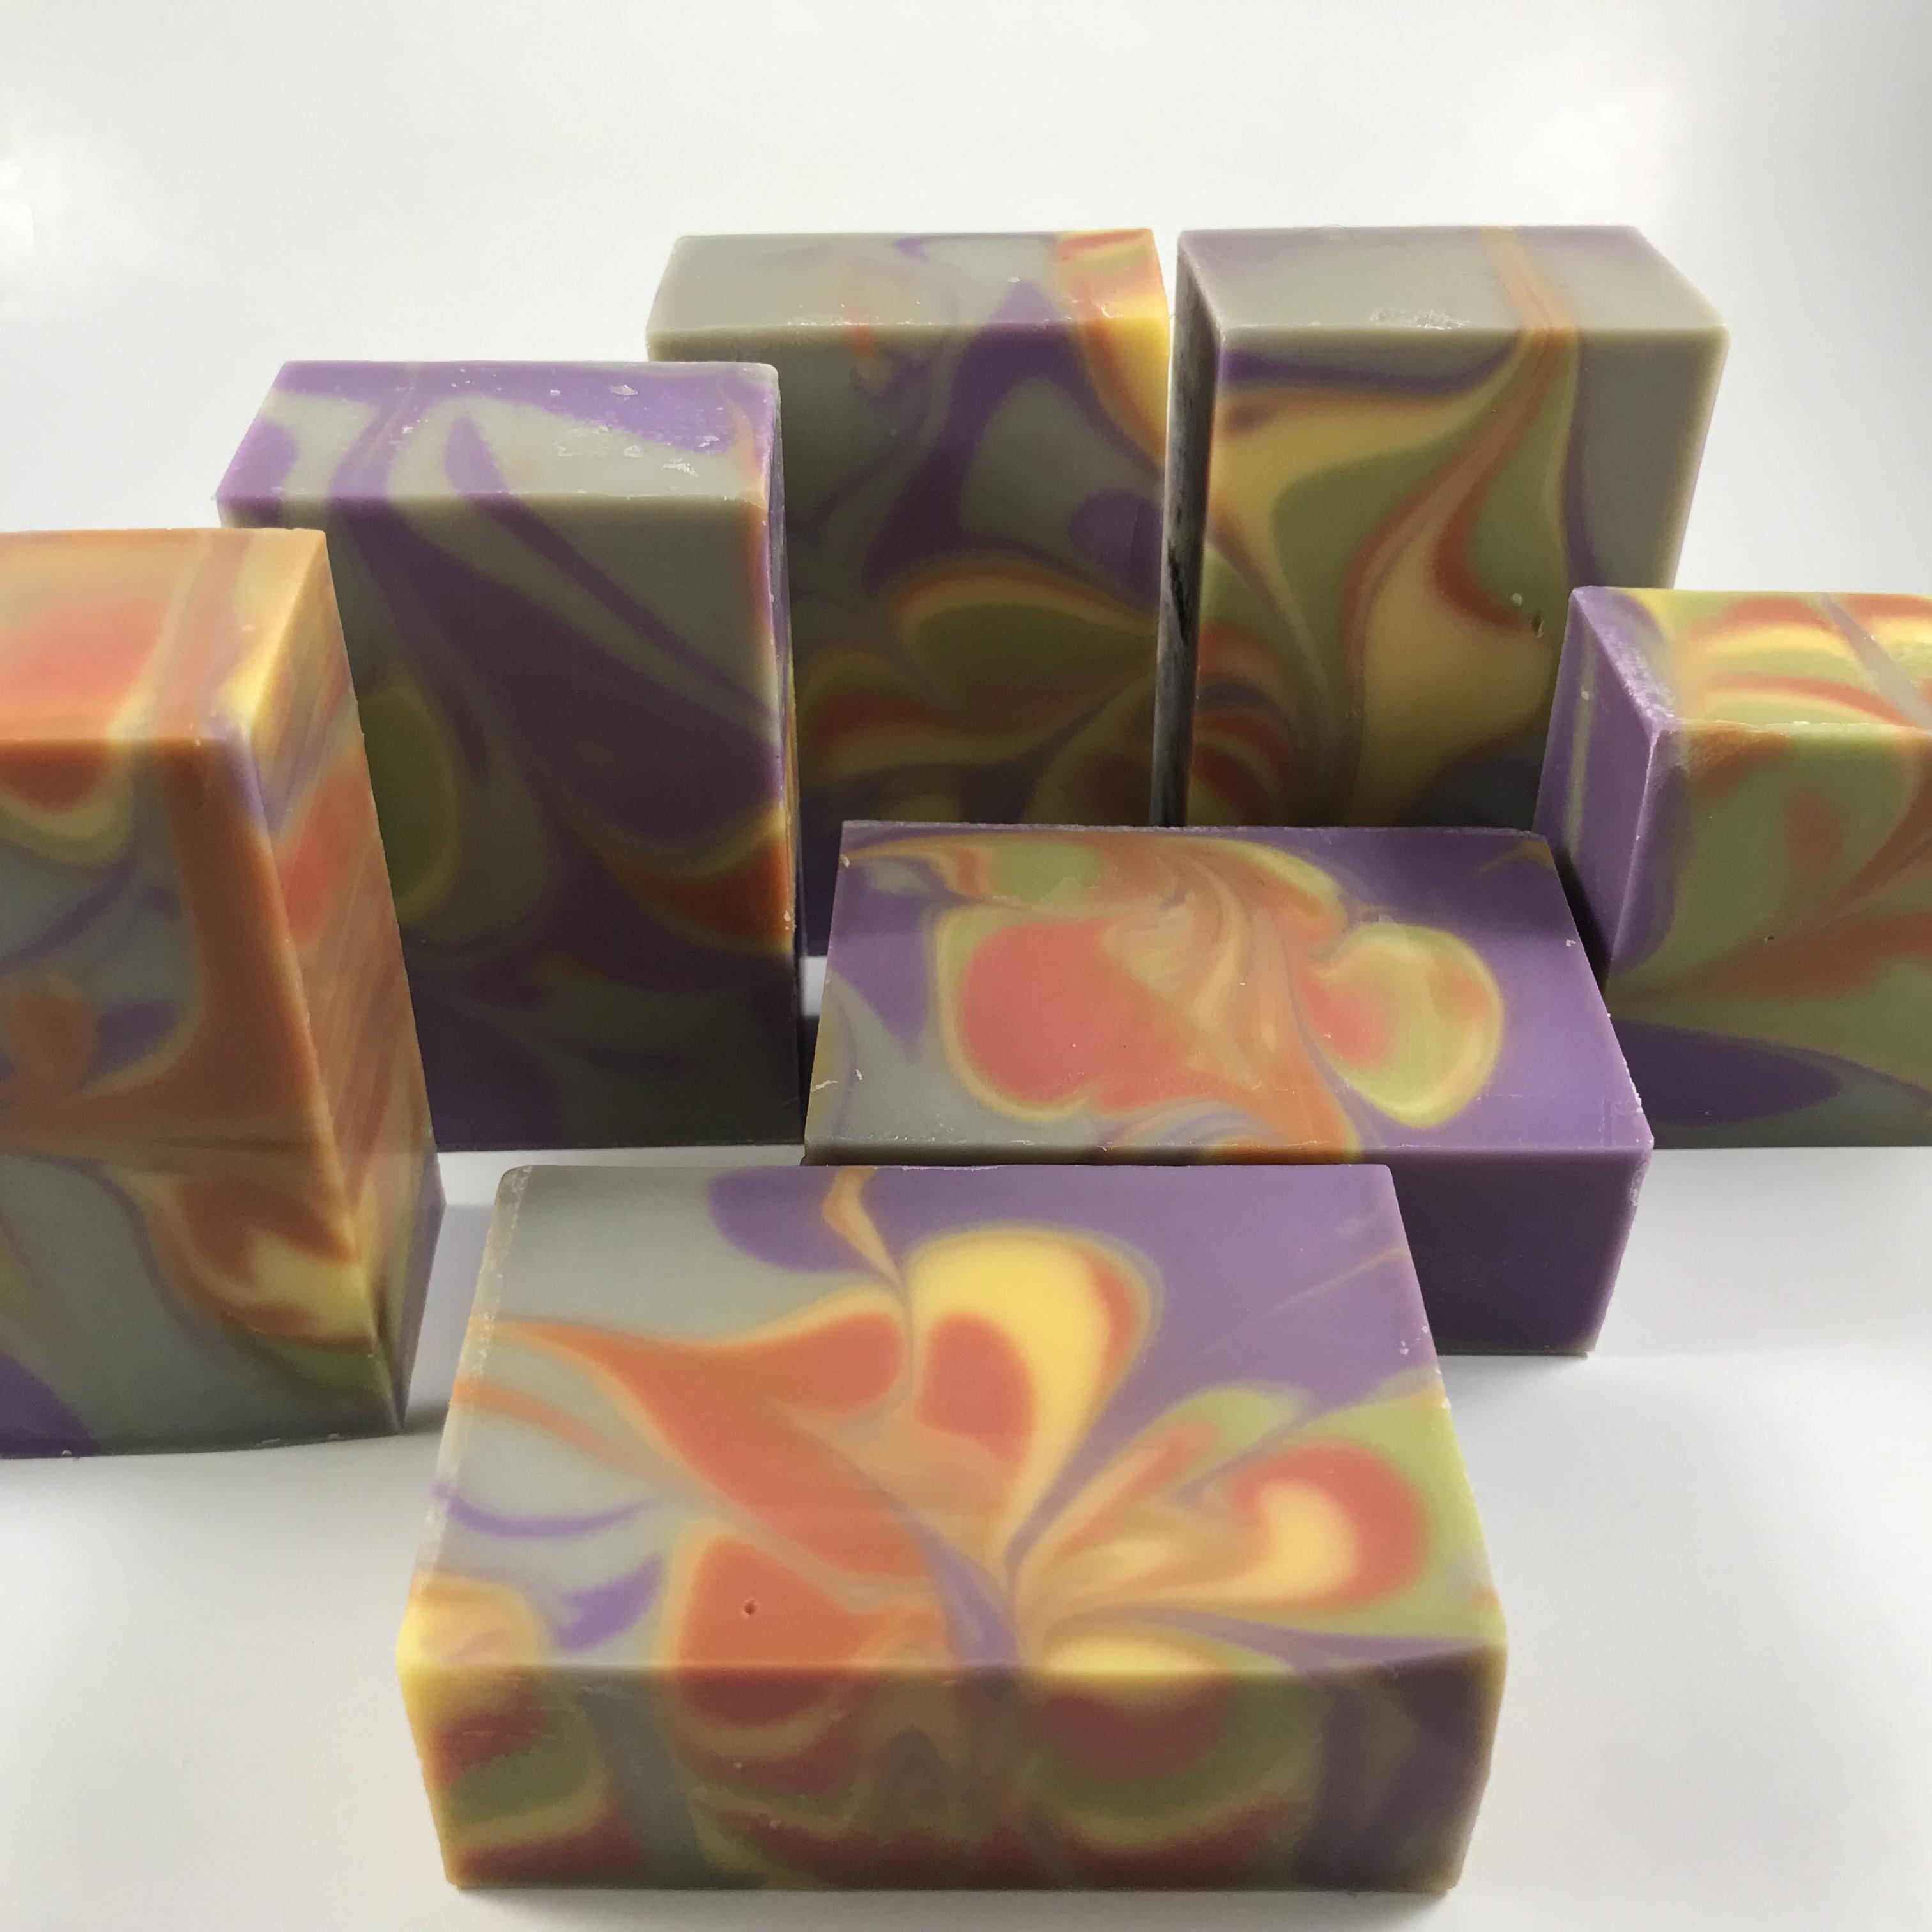 lavender pipes